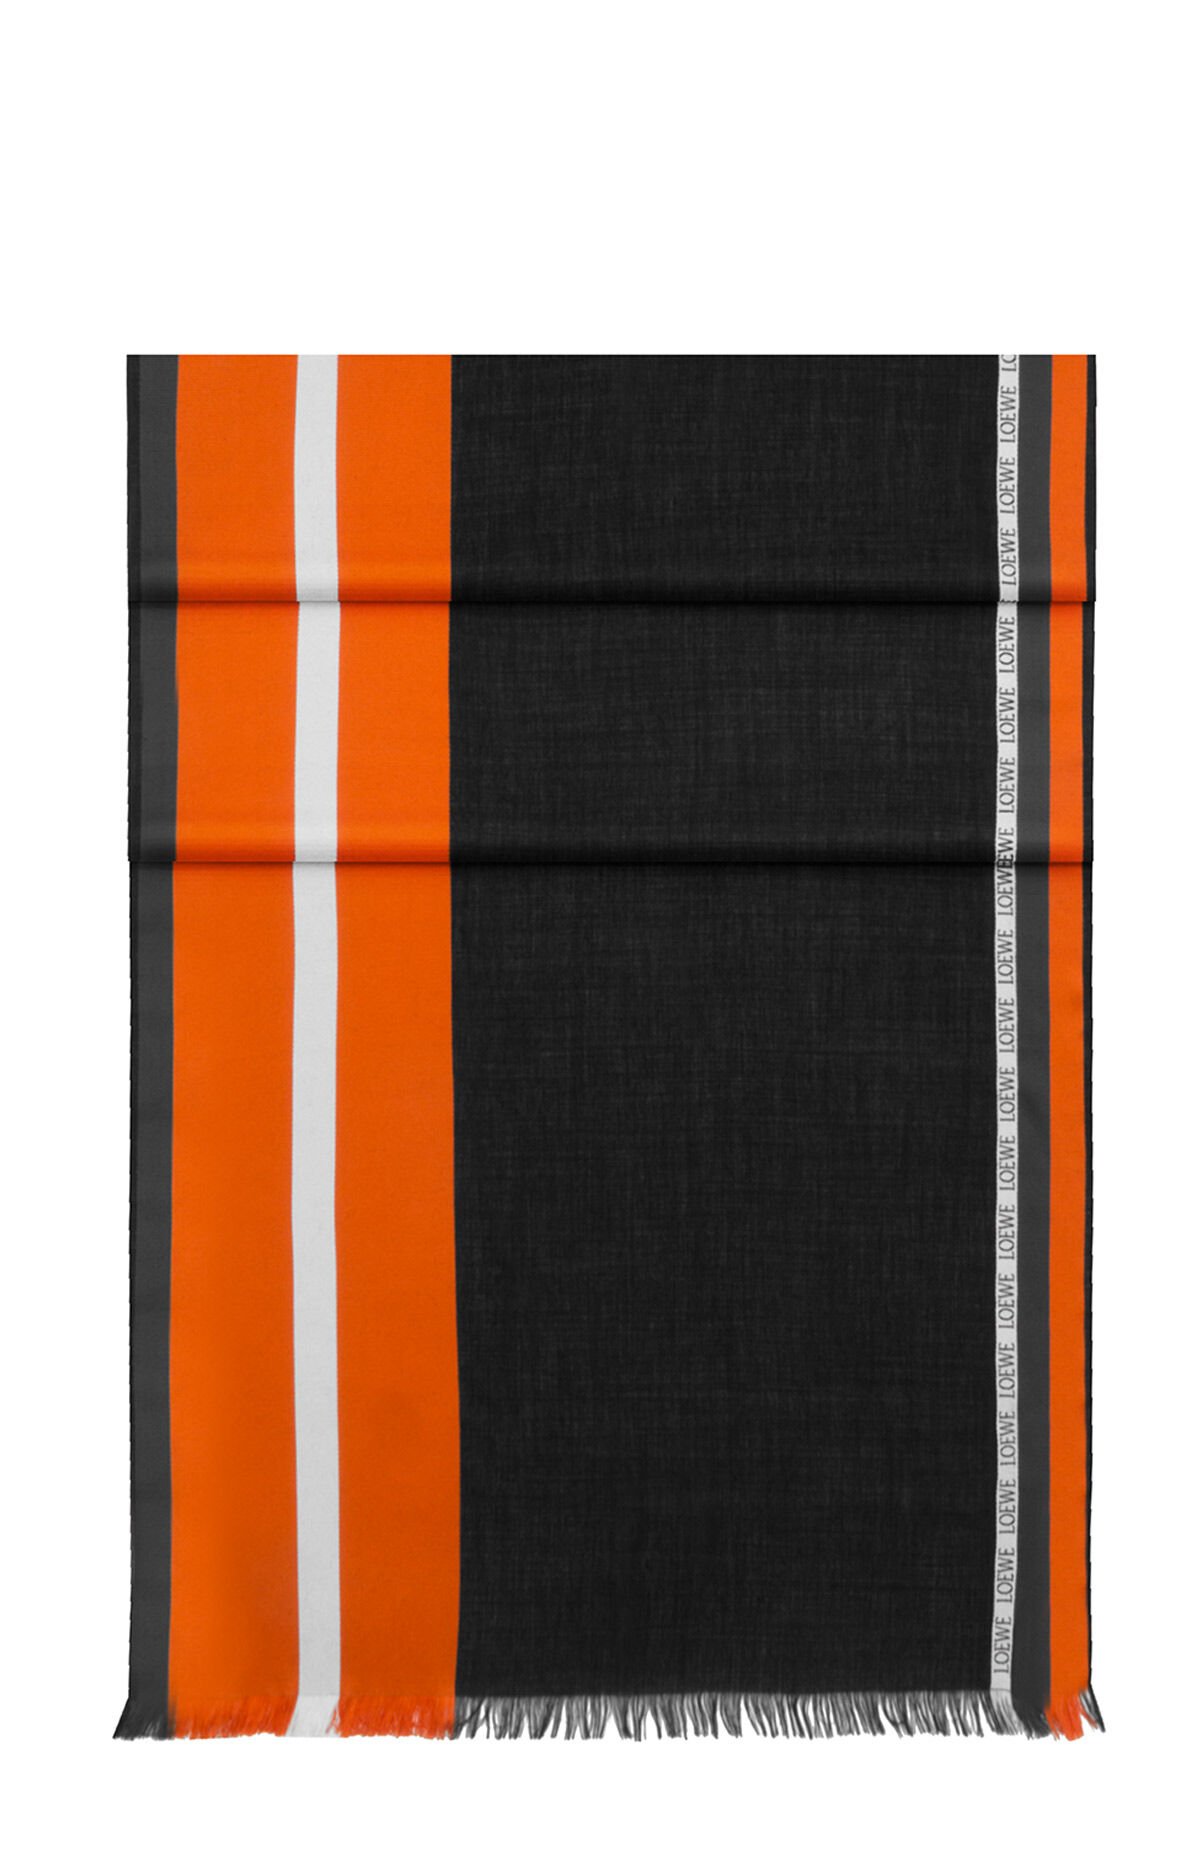 LOEWE 70X200 Scarf Stripes Naranja/Negro all